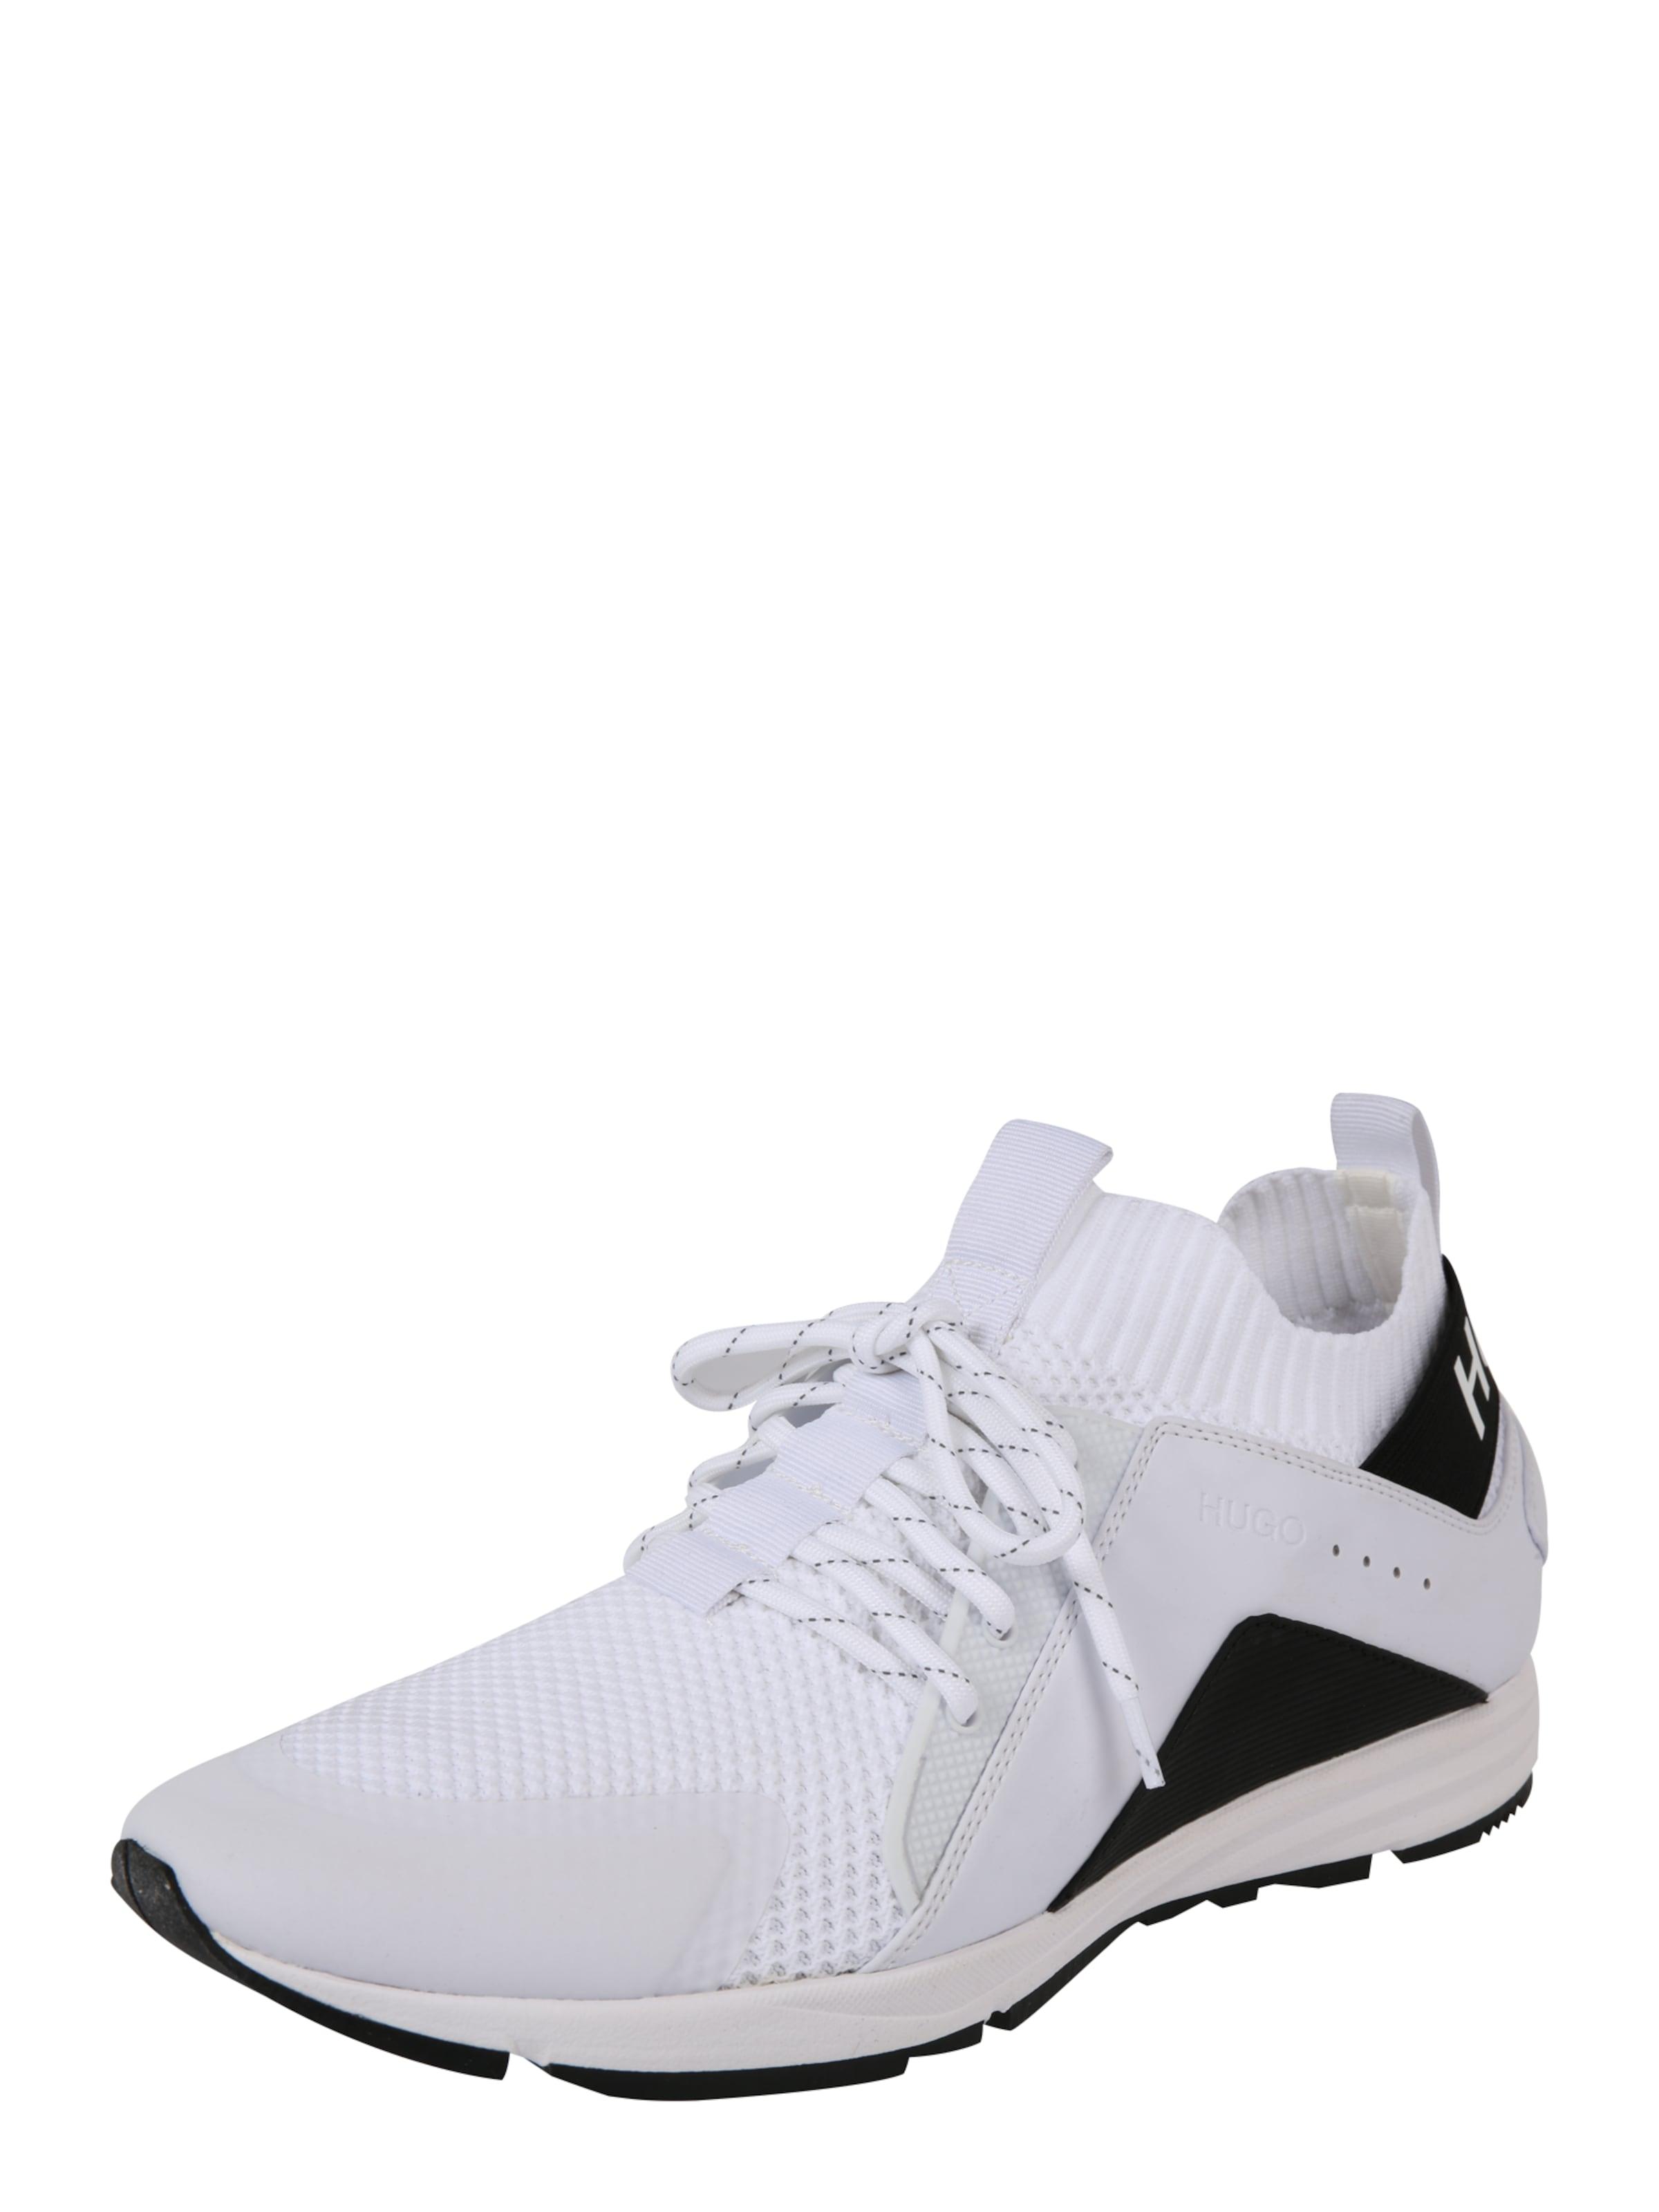 knmx' Hugo 'hybrid In Sneaker Weiß runn xdCeoB